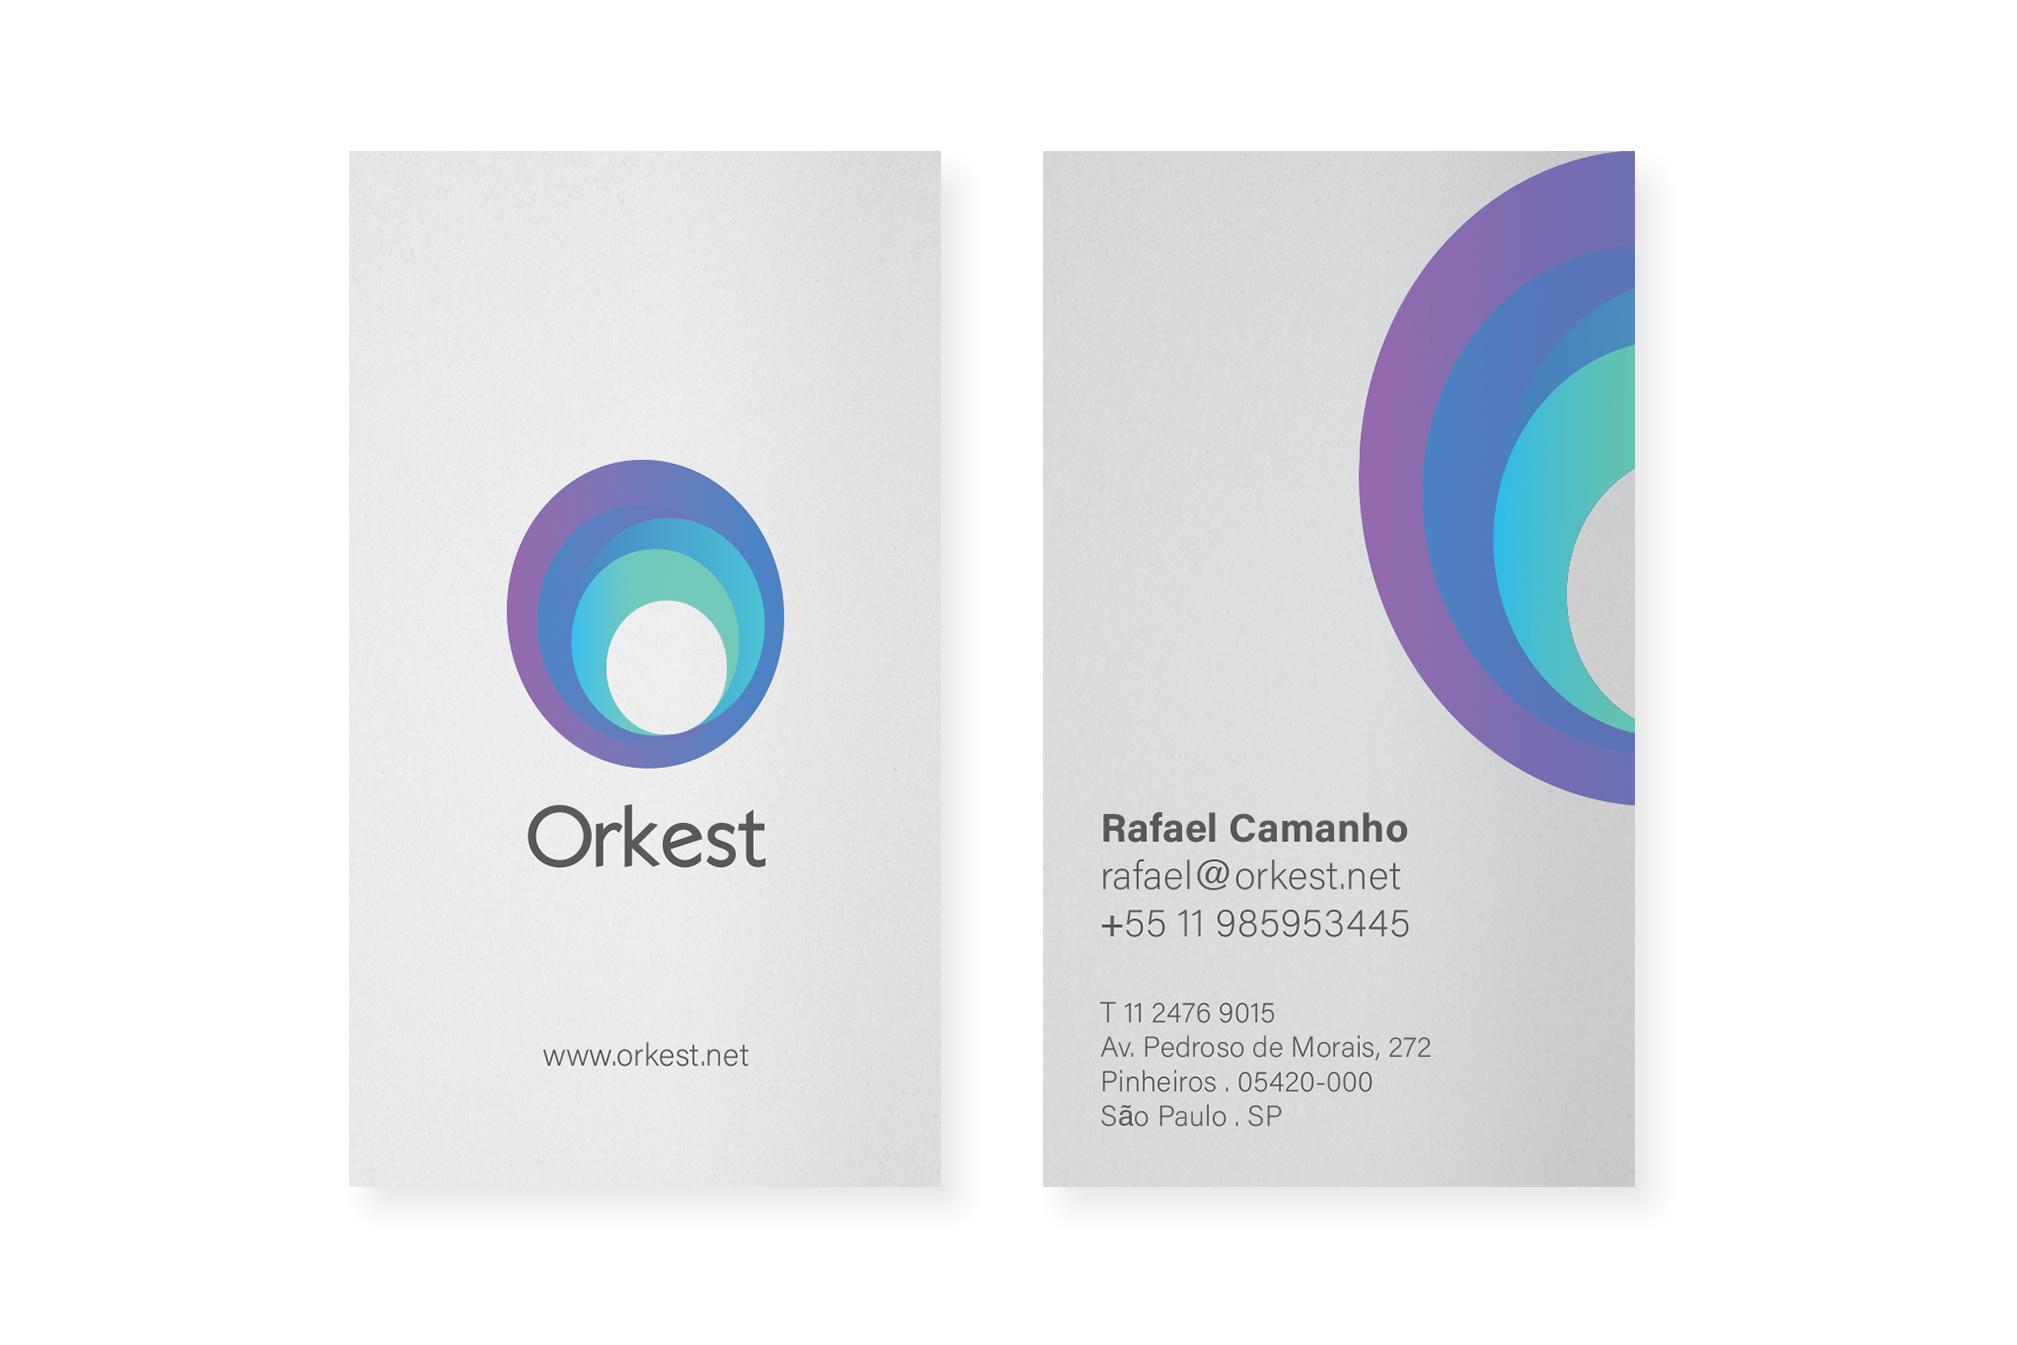 orkest_BusinessCard.jpg